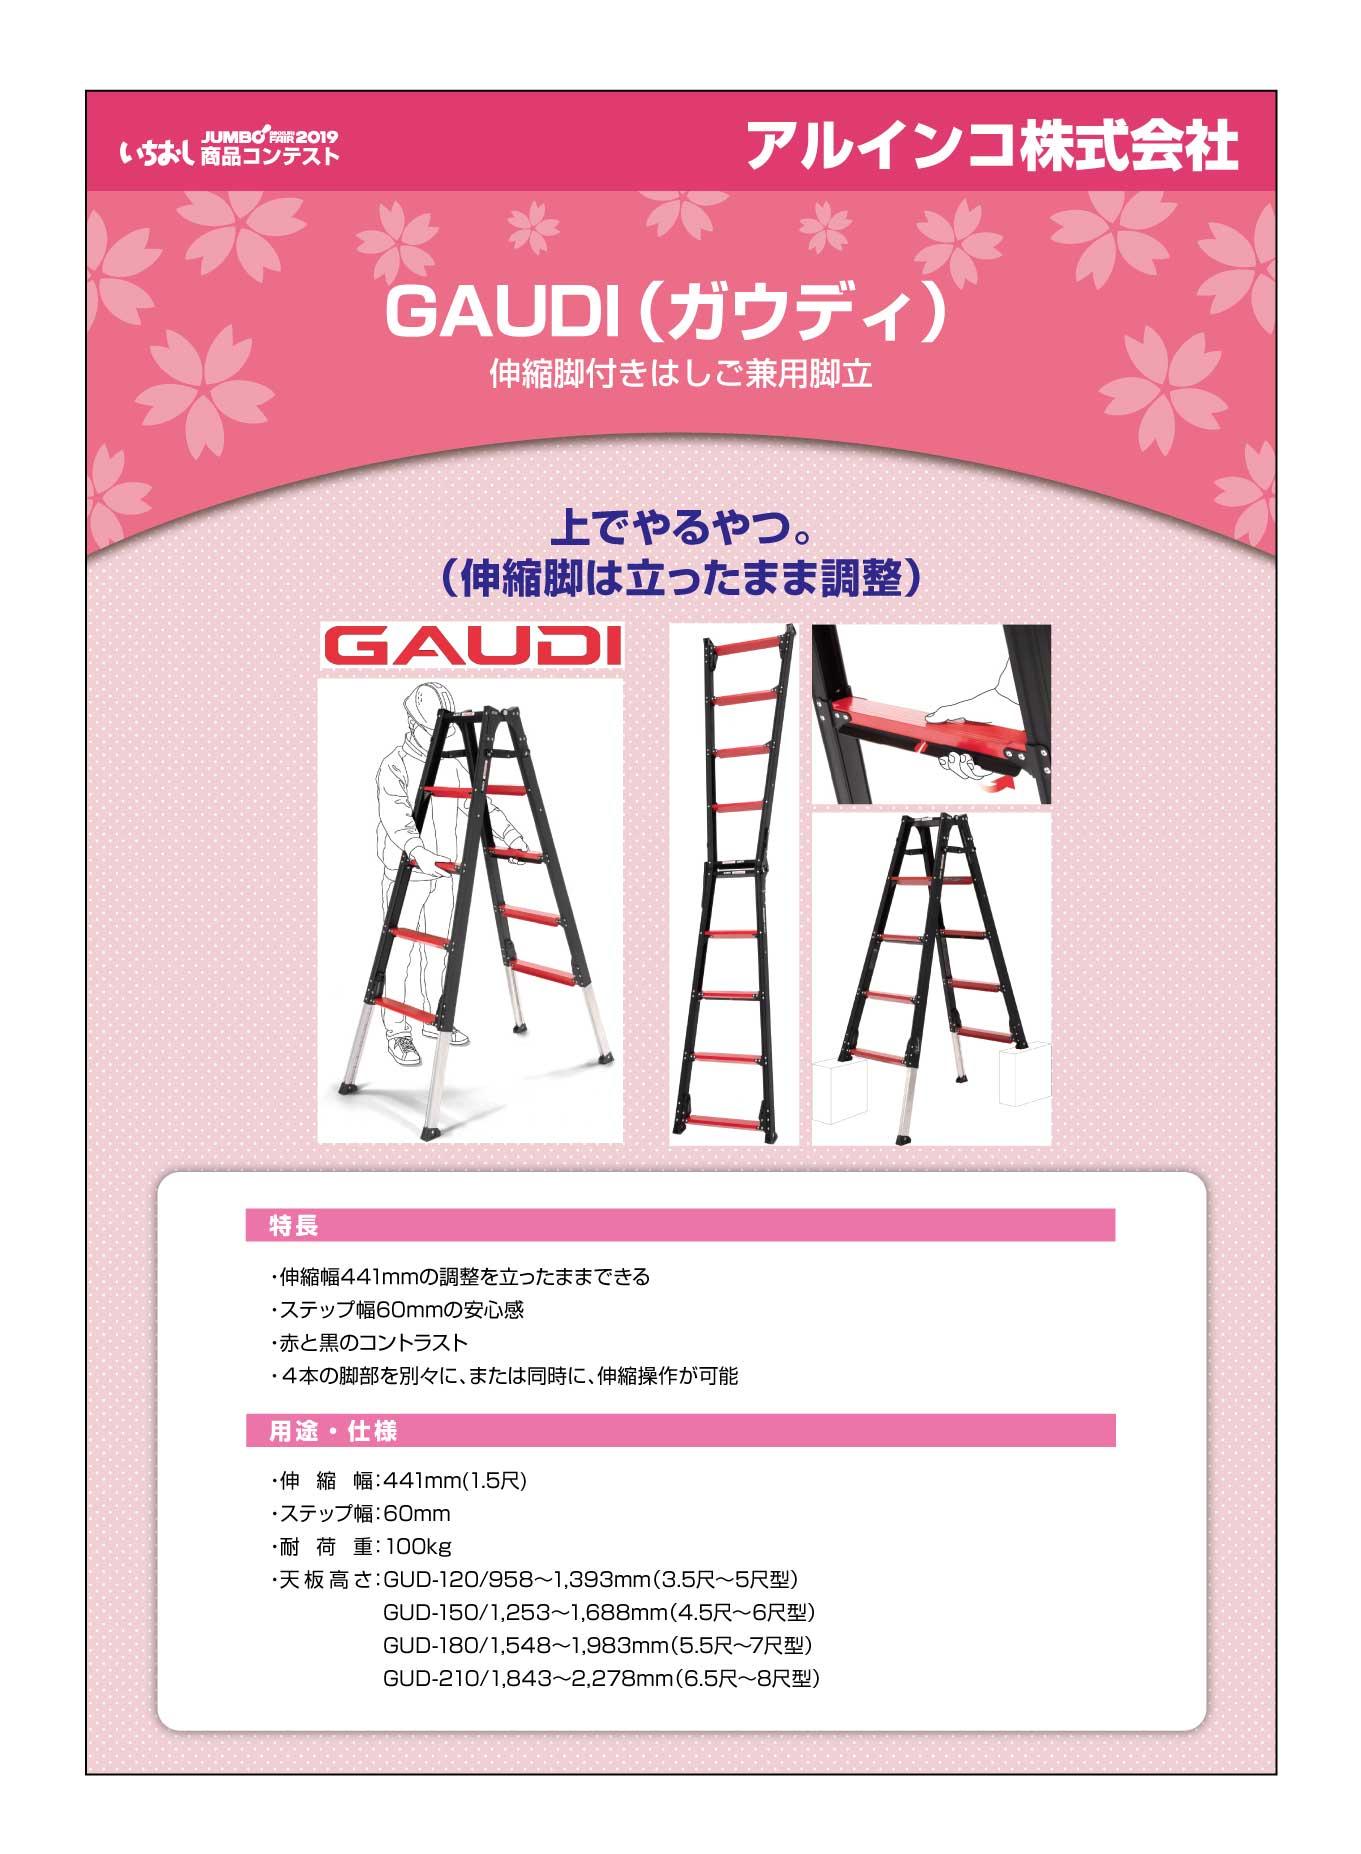 「GAUDI(伸縮脚付きはしご兼用脚立)」アルインコ株式会社の画像